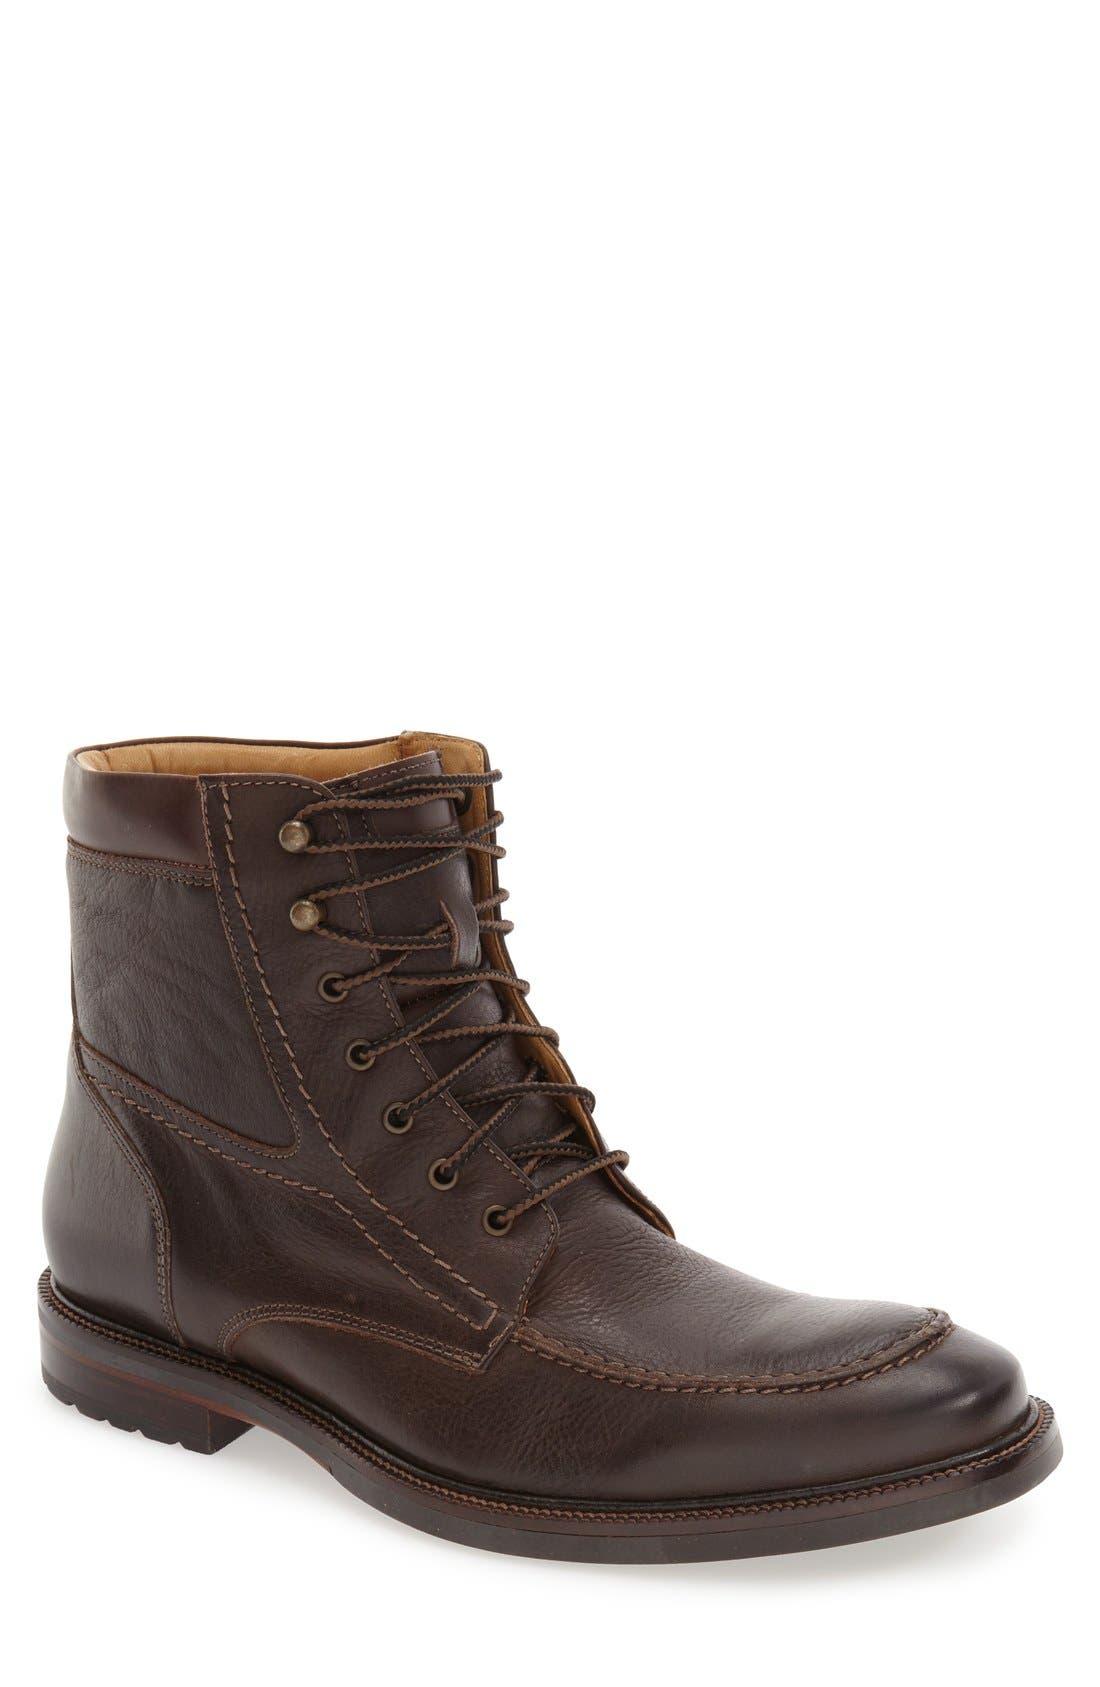 J&M 1850 Baird Moc Toe Boot